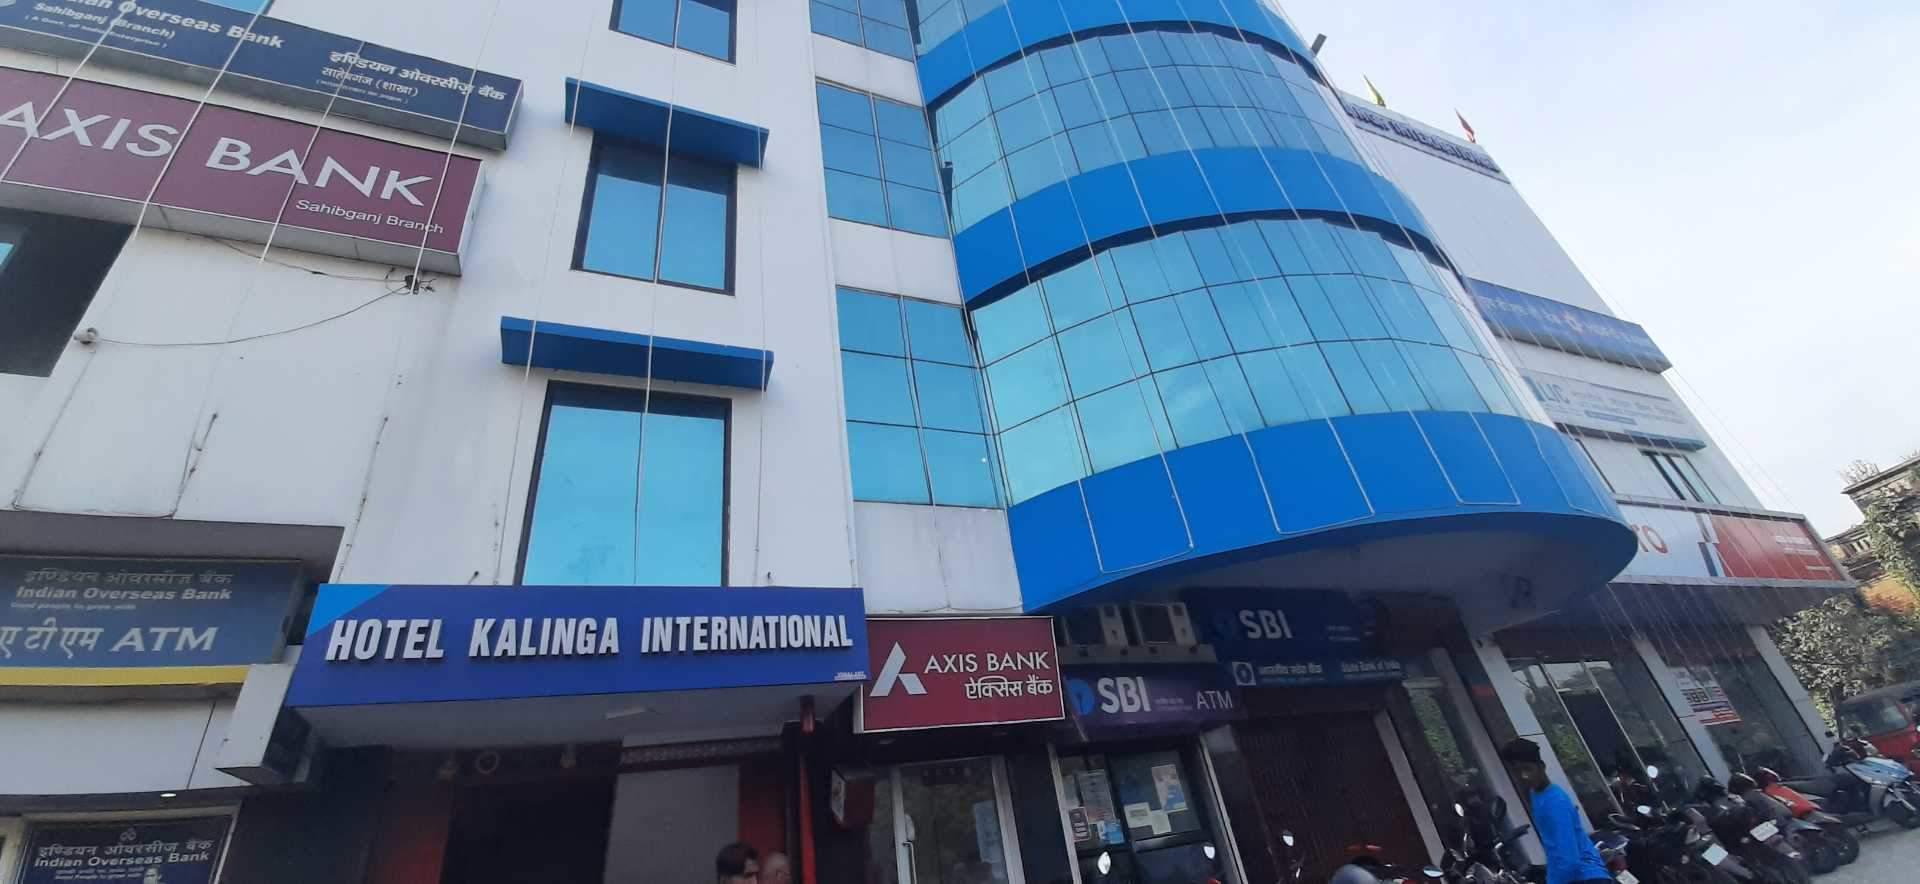 Most Comfortable Place To Stay Near Bindudham-Hotel Kalinga International